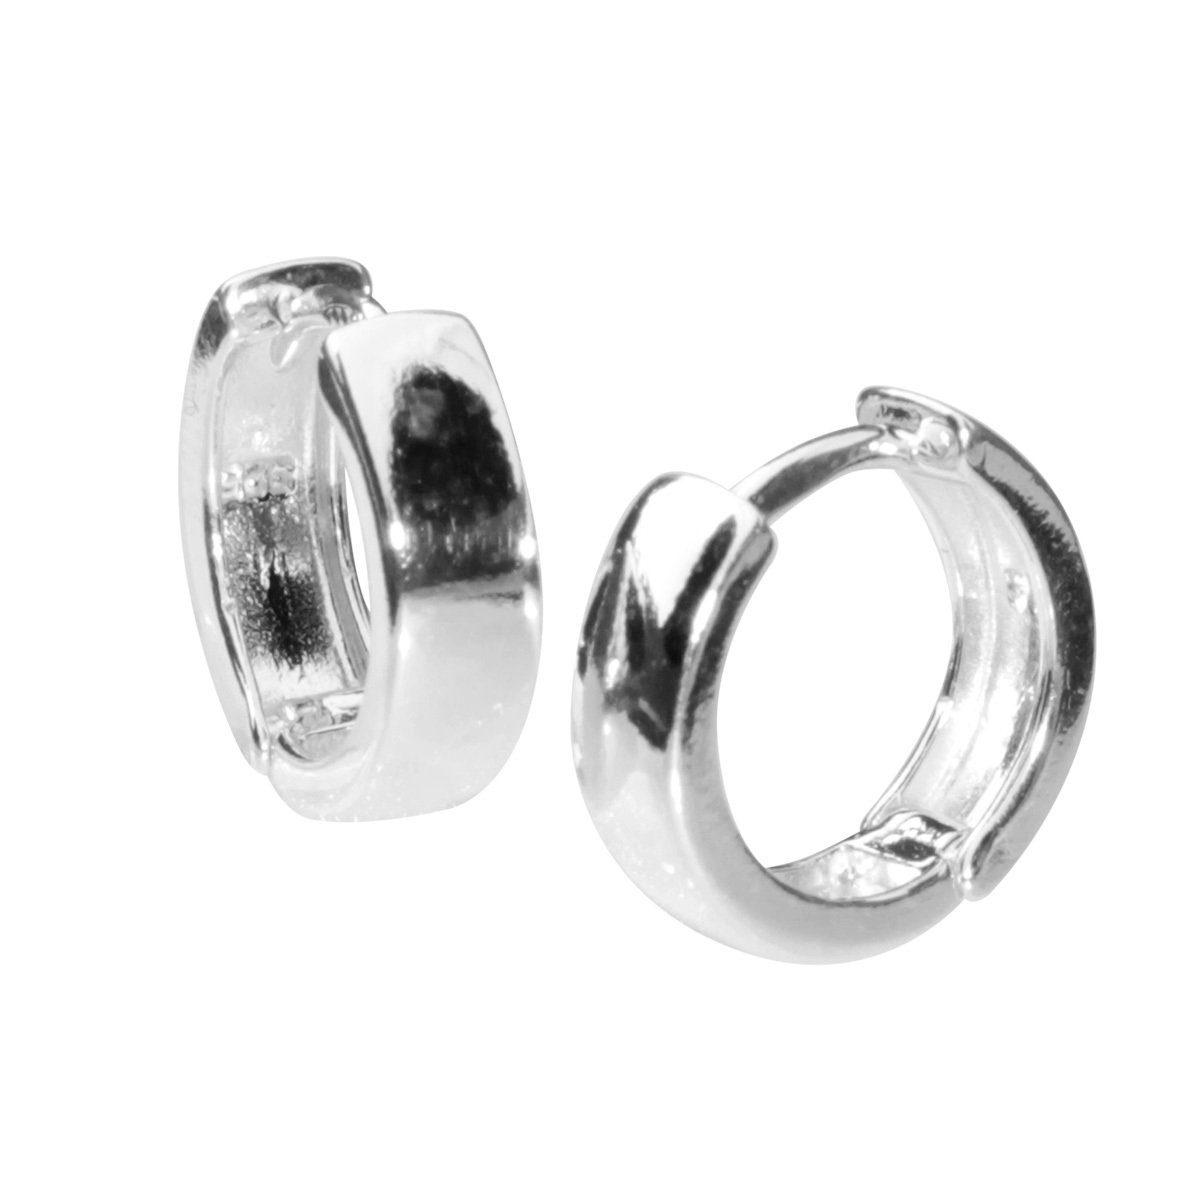 OSTSEE-SCHMUCK Creole »Babsi 14.40 Silber 925/000«